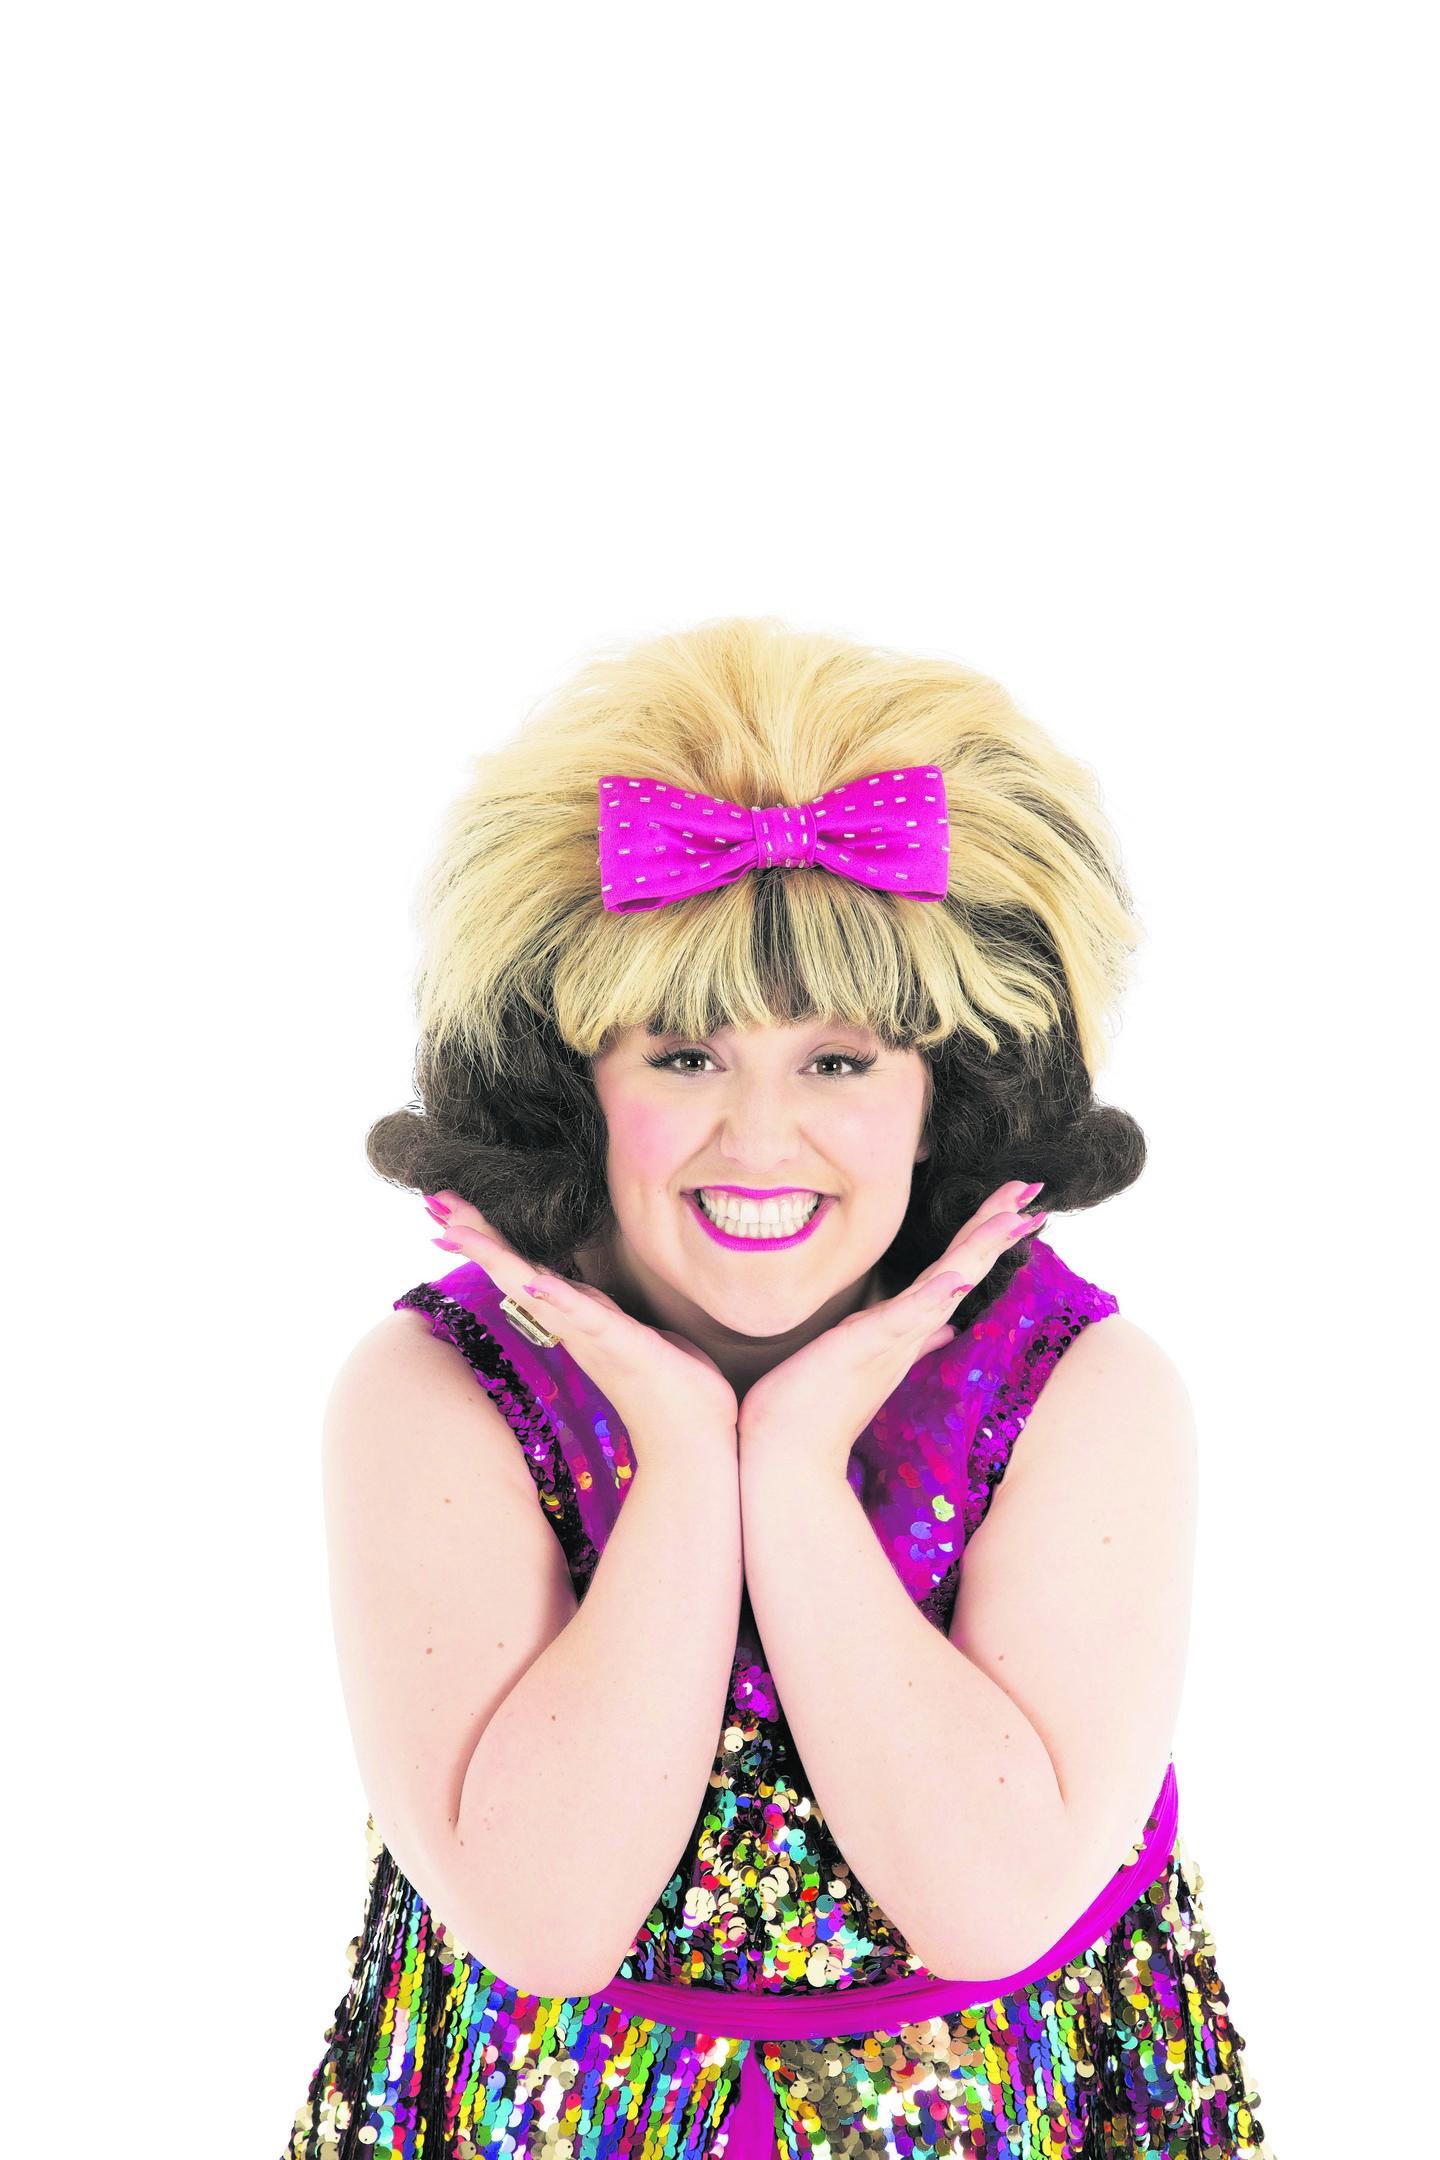 Freya Sutton as Tracy Turnblad  in Hairspray. PHOTOS: Ellie Kurttz